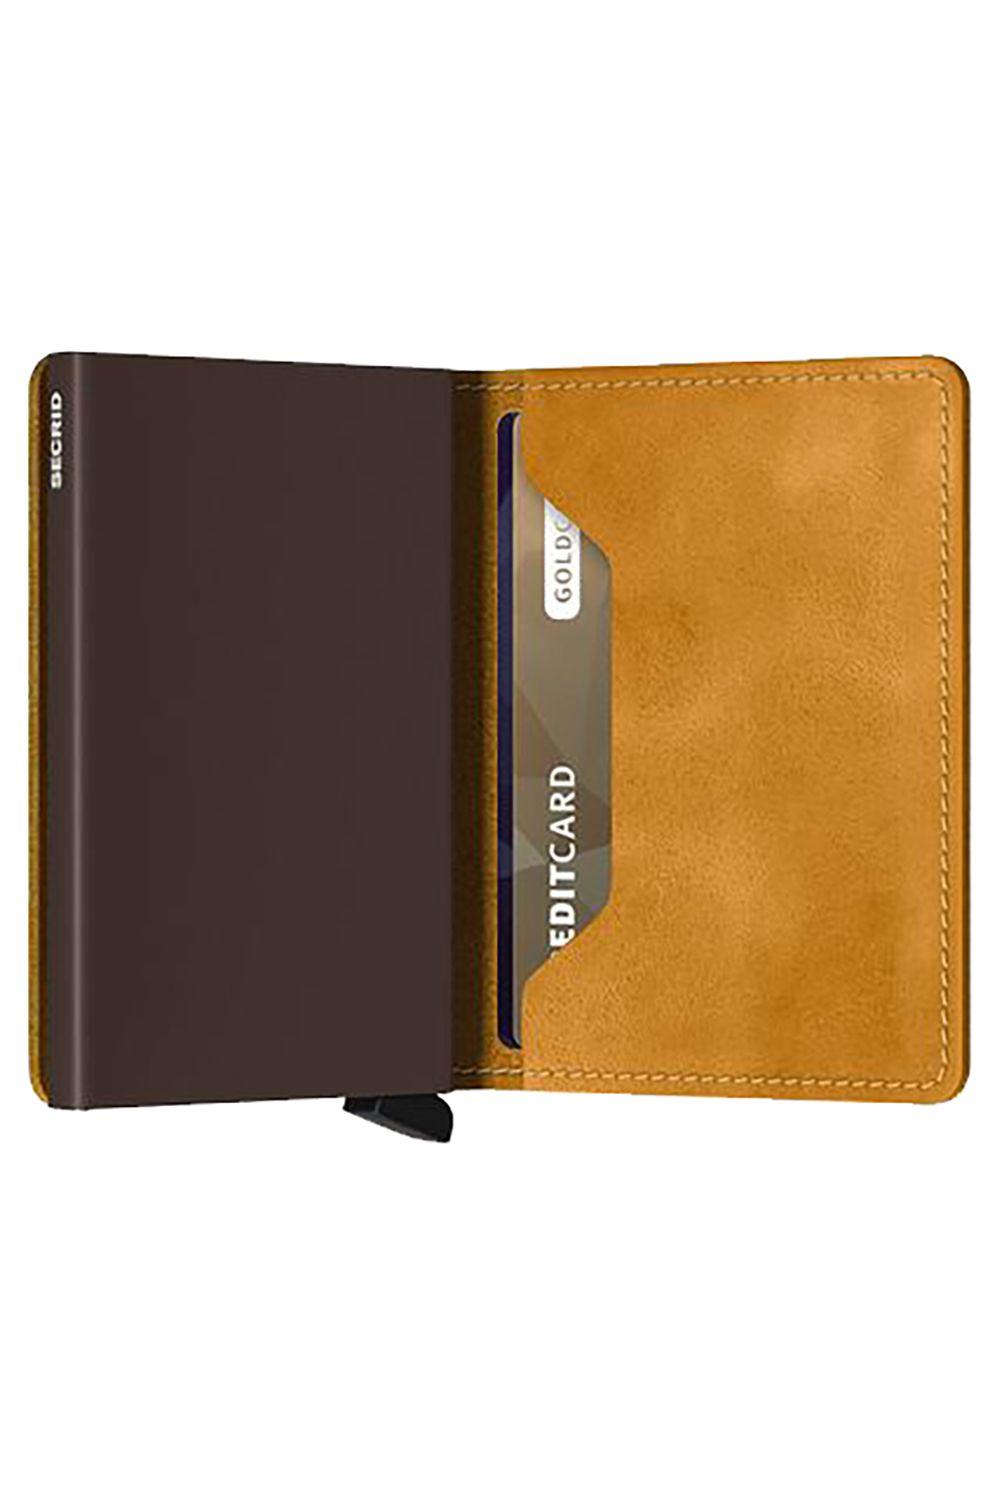 Secrid Leather Wallet SLIMWALLET VINTAGE Ochre